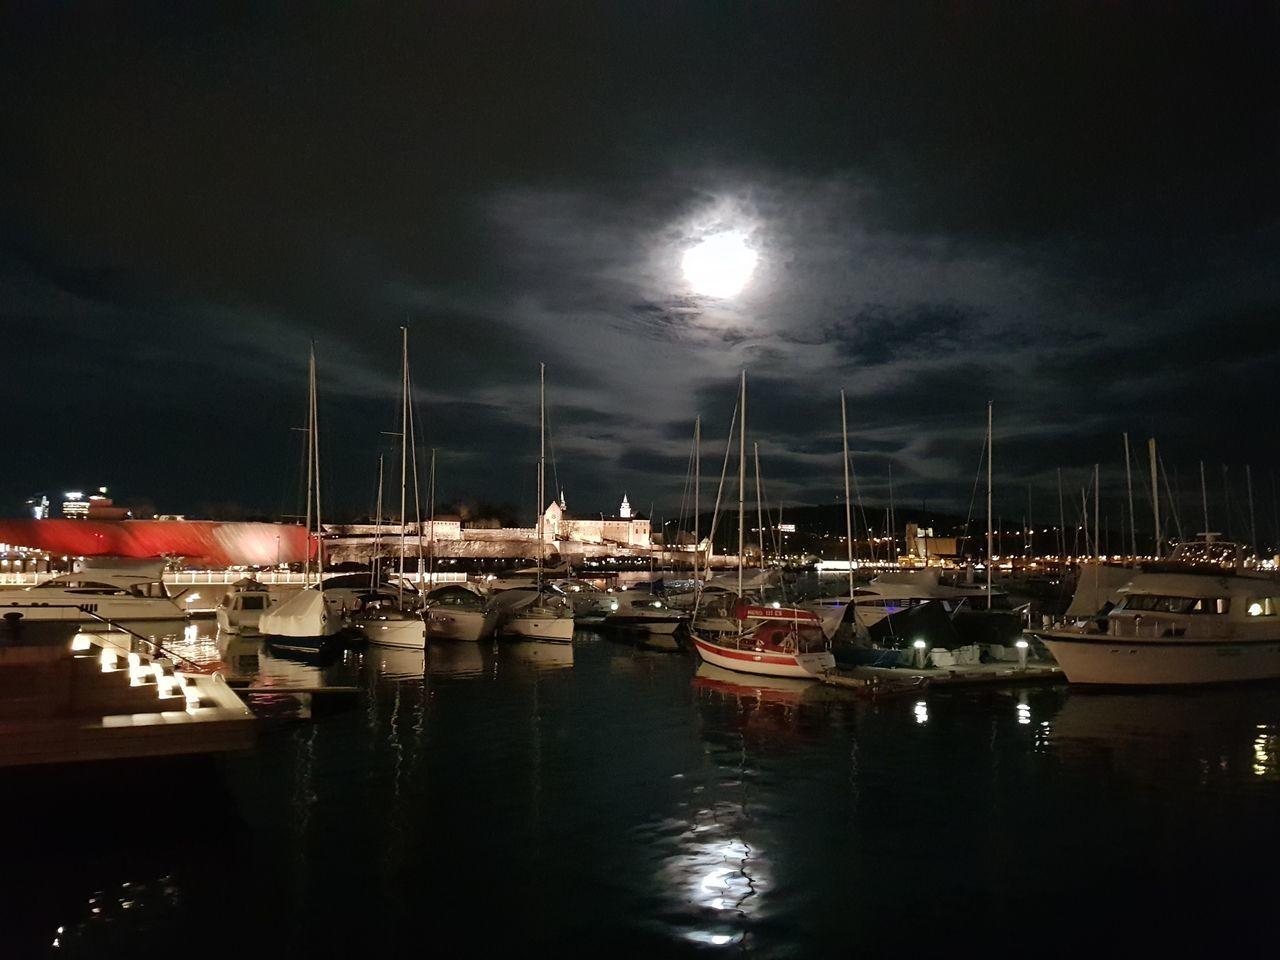 nautical vessel, transportation, water, moored, sky, mode of transportation, cloud - sky, harbor, night, sailboat, reflection, mast, illuminated, nature, sea, no people, waterfront, pole, architecture, yacht, outdoors, marina, full moon, moonlight, port